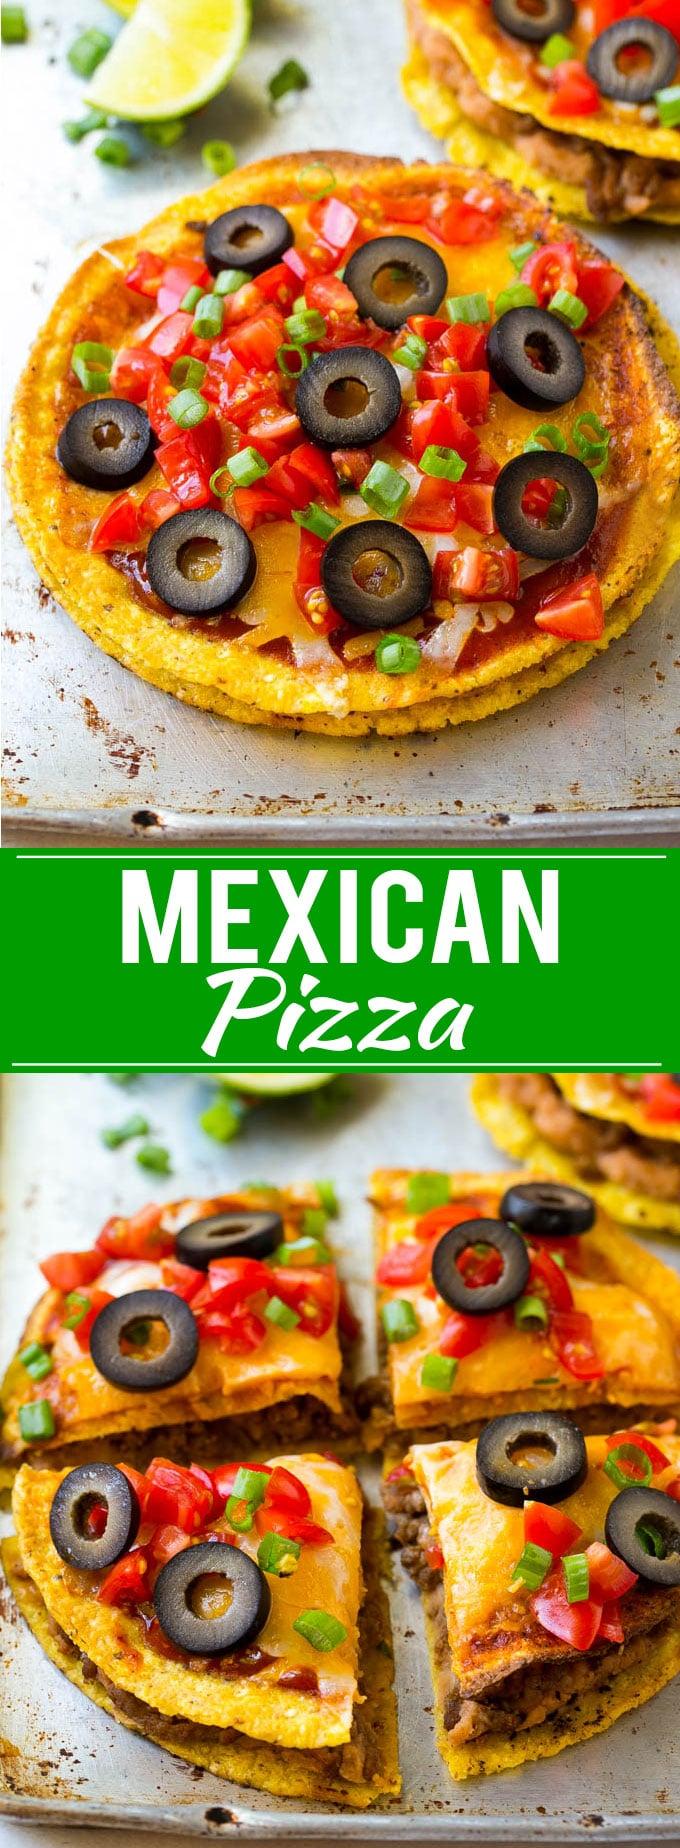 Mexican Pizza Recipe | Tostada Recipe | Taco Bell Copycat Recipe | Easy Mexican Food #mexicanfood #pizza #beef #tostada #dinner #dinneratthezoo